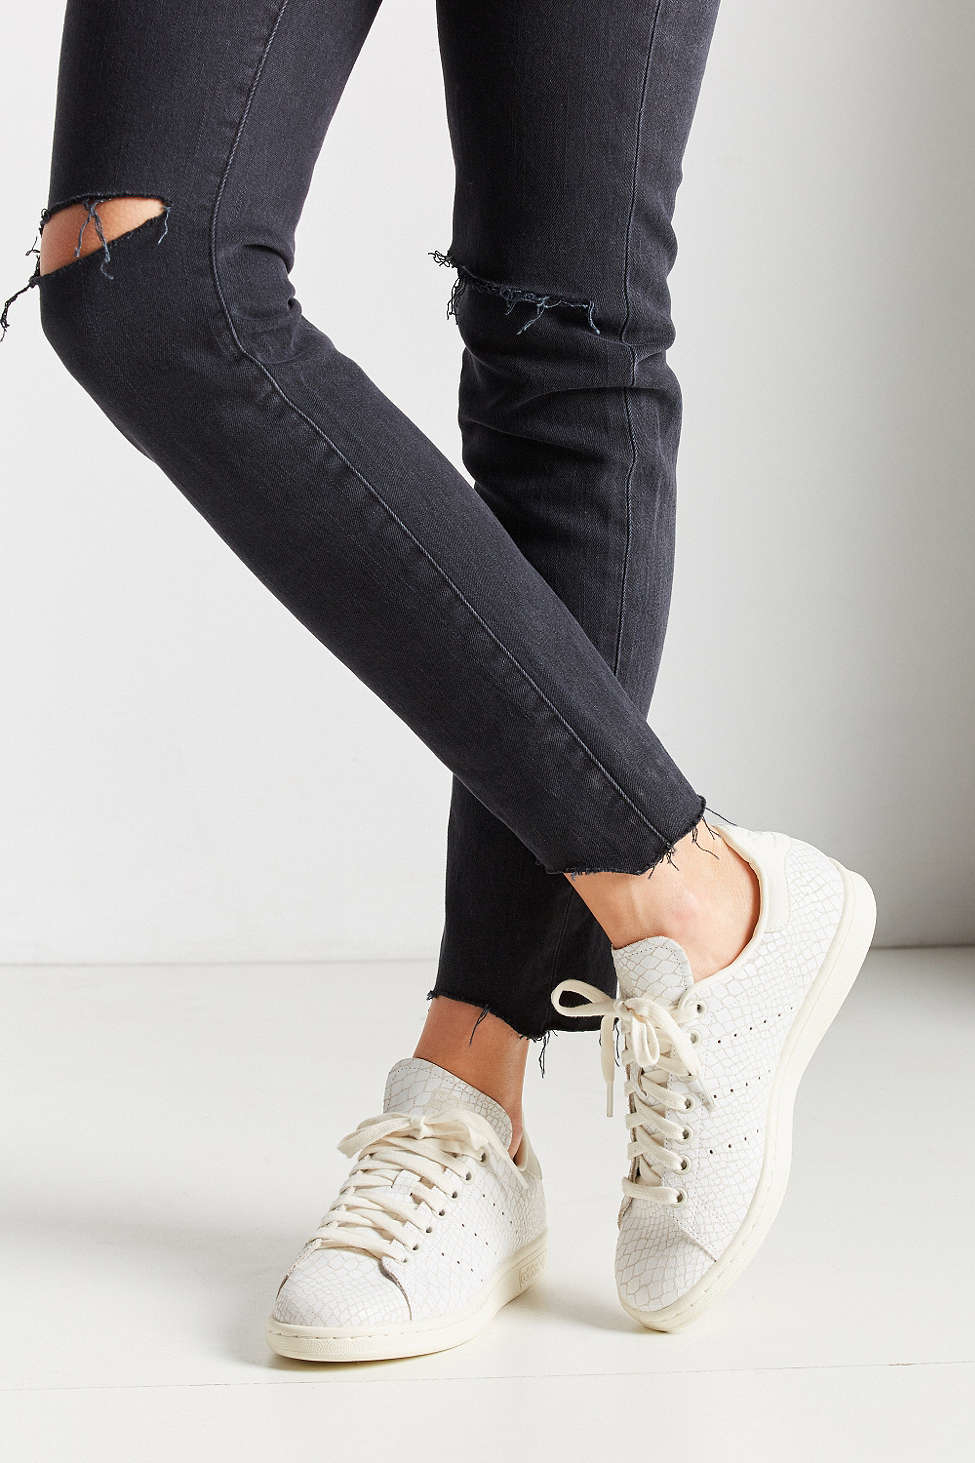 Adidas Originals Mens Superstar Reptile Sneakers NWT